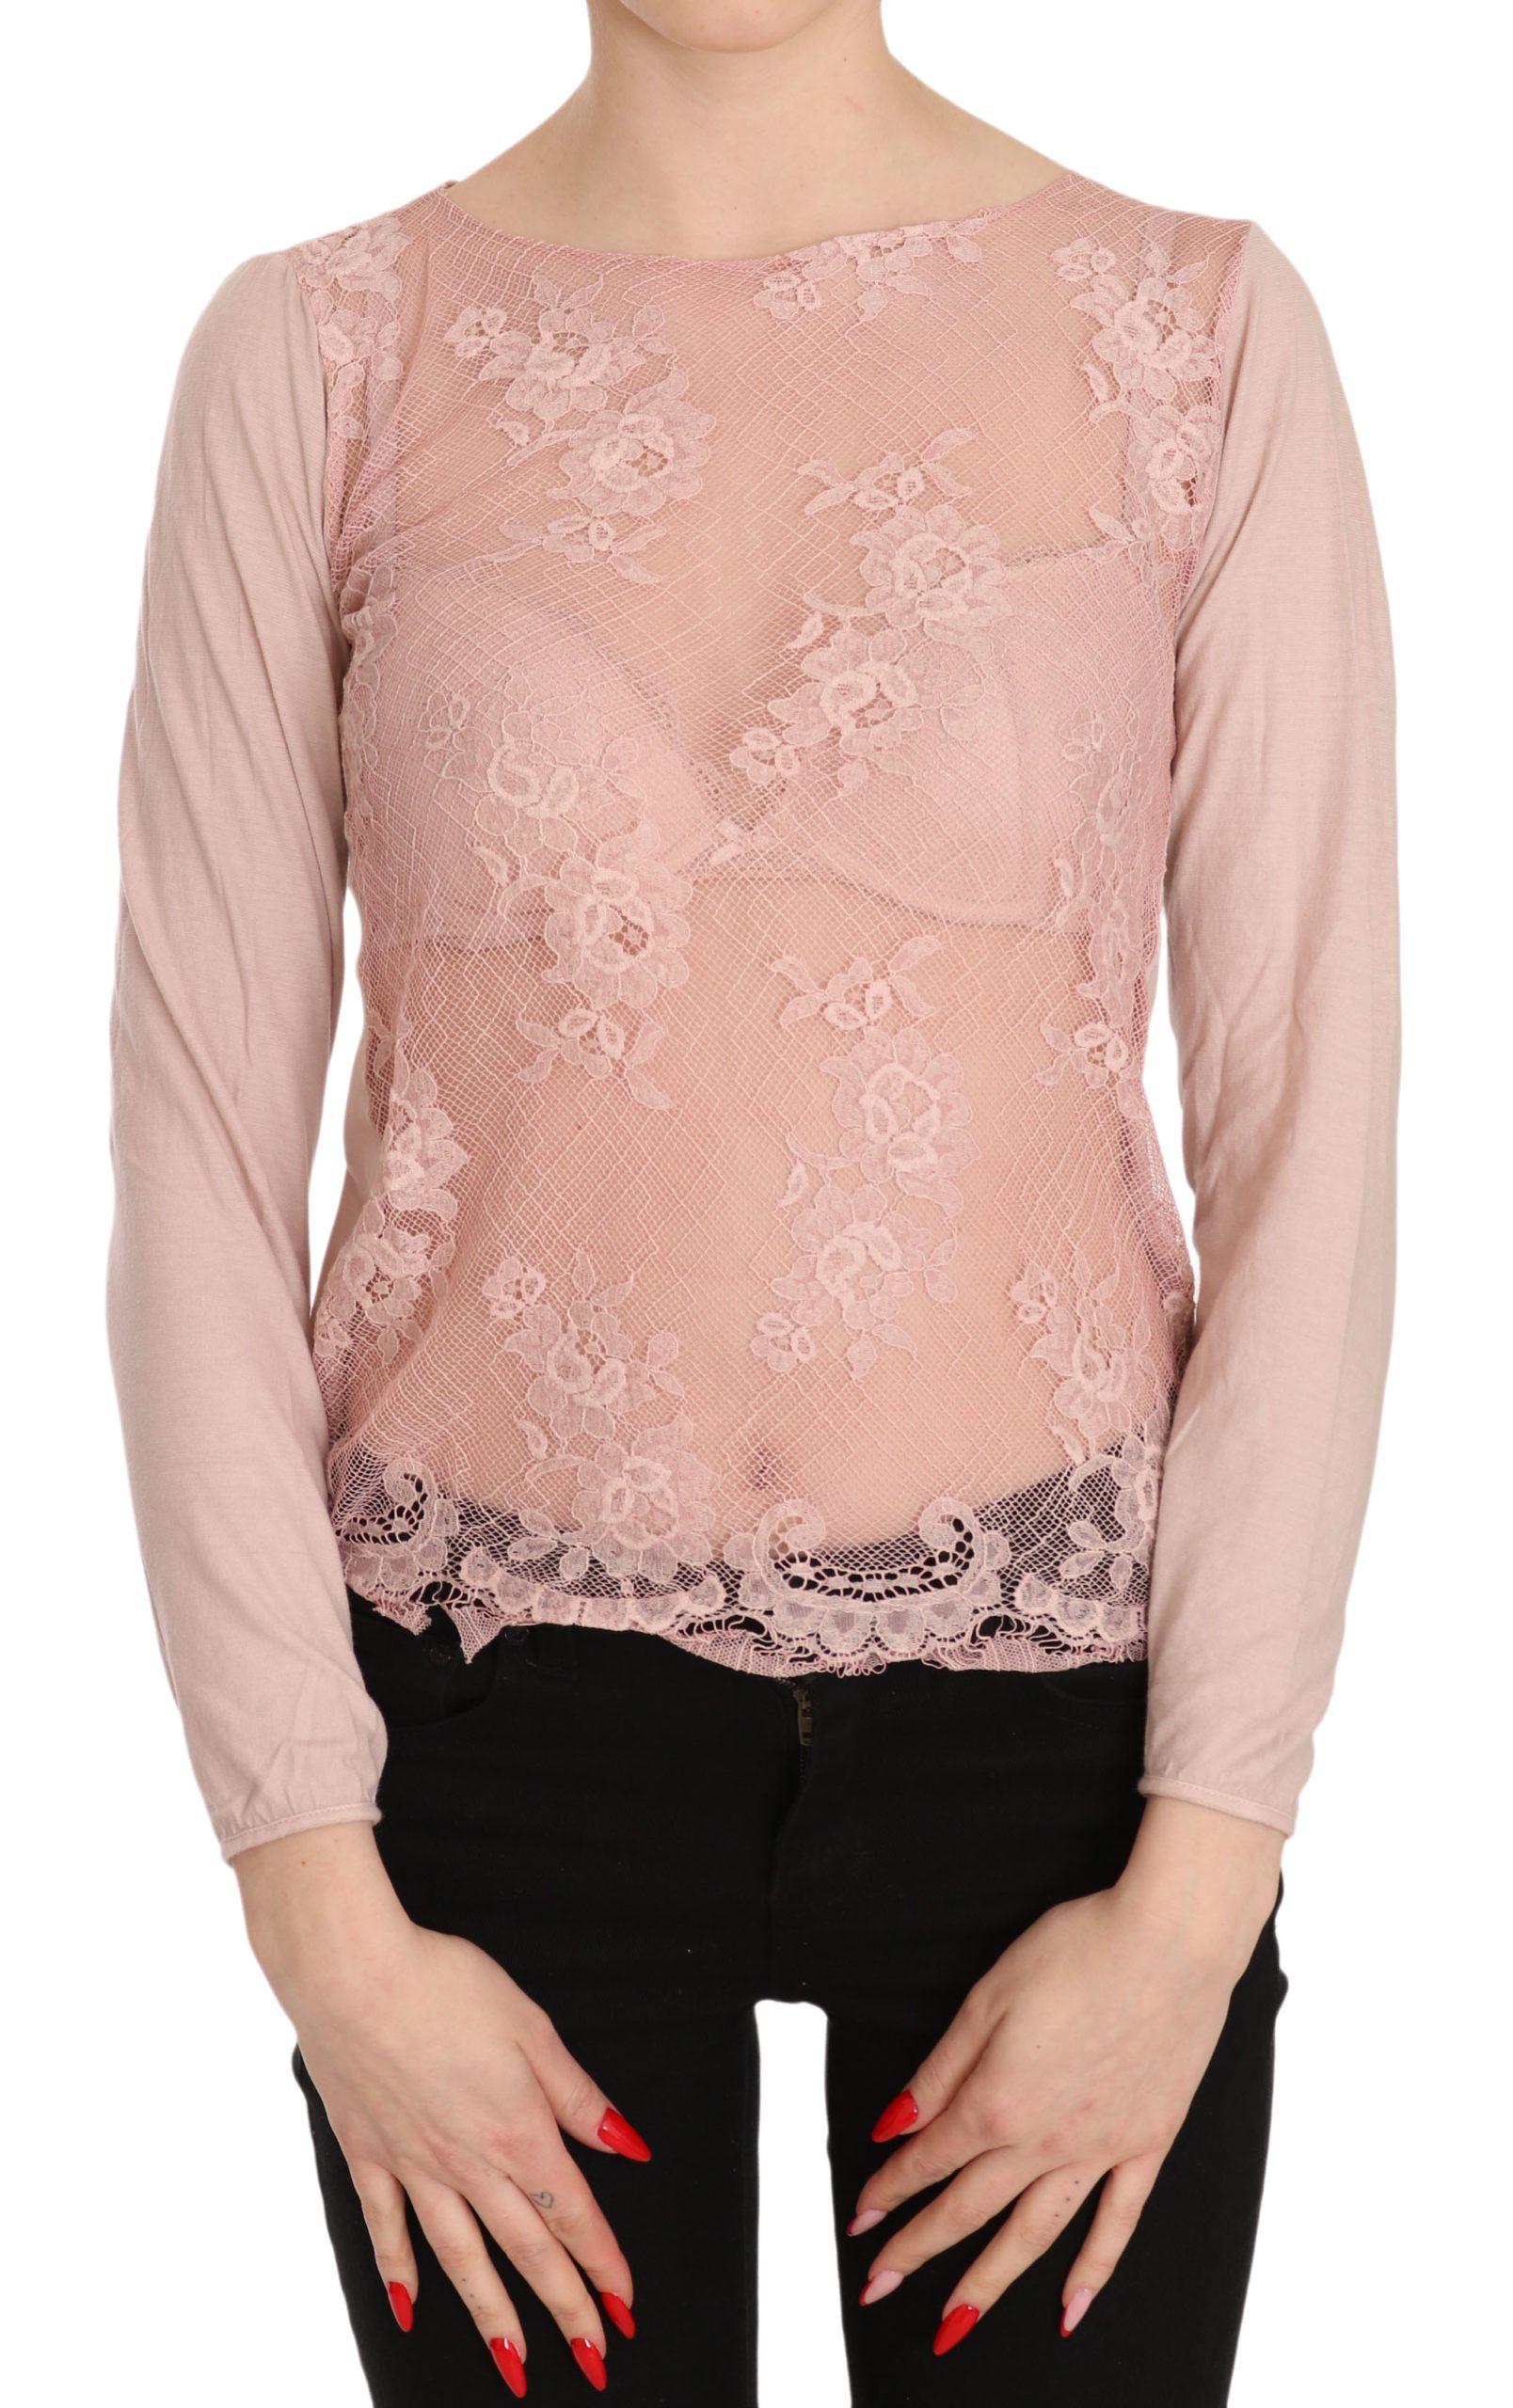 PINK MEMORIES Women's Lace See Through LS Top Pink TSH3453 - IT42 | S